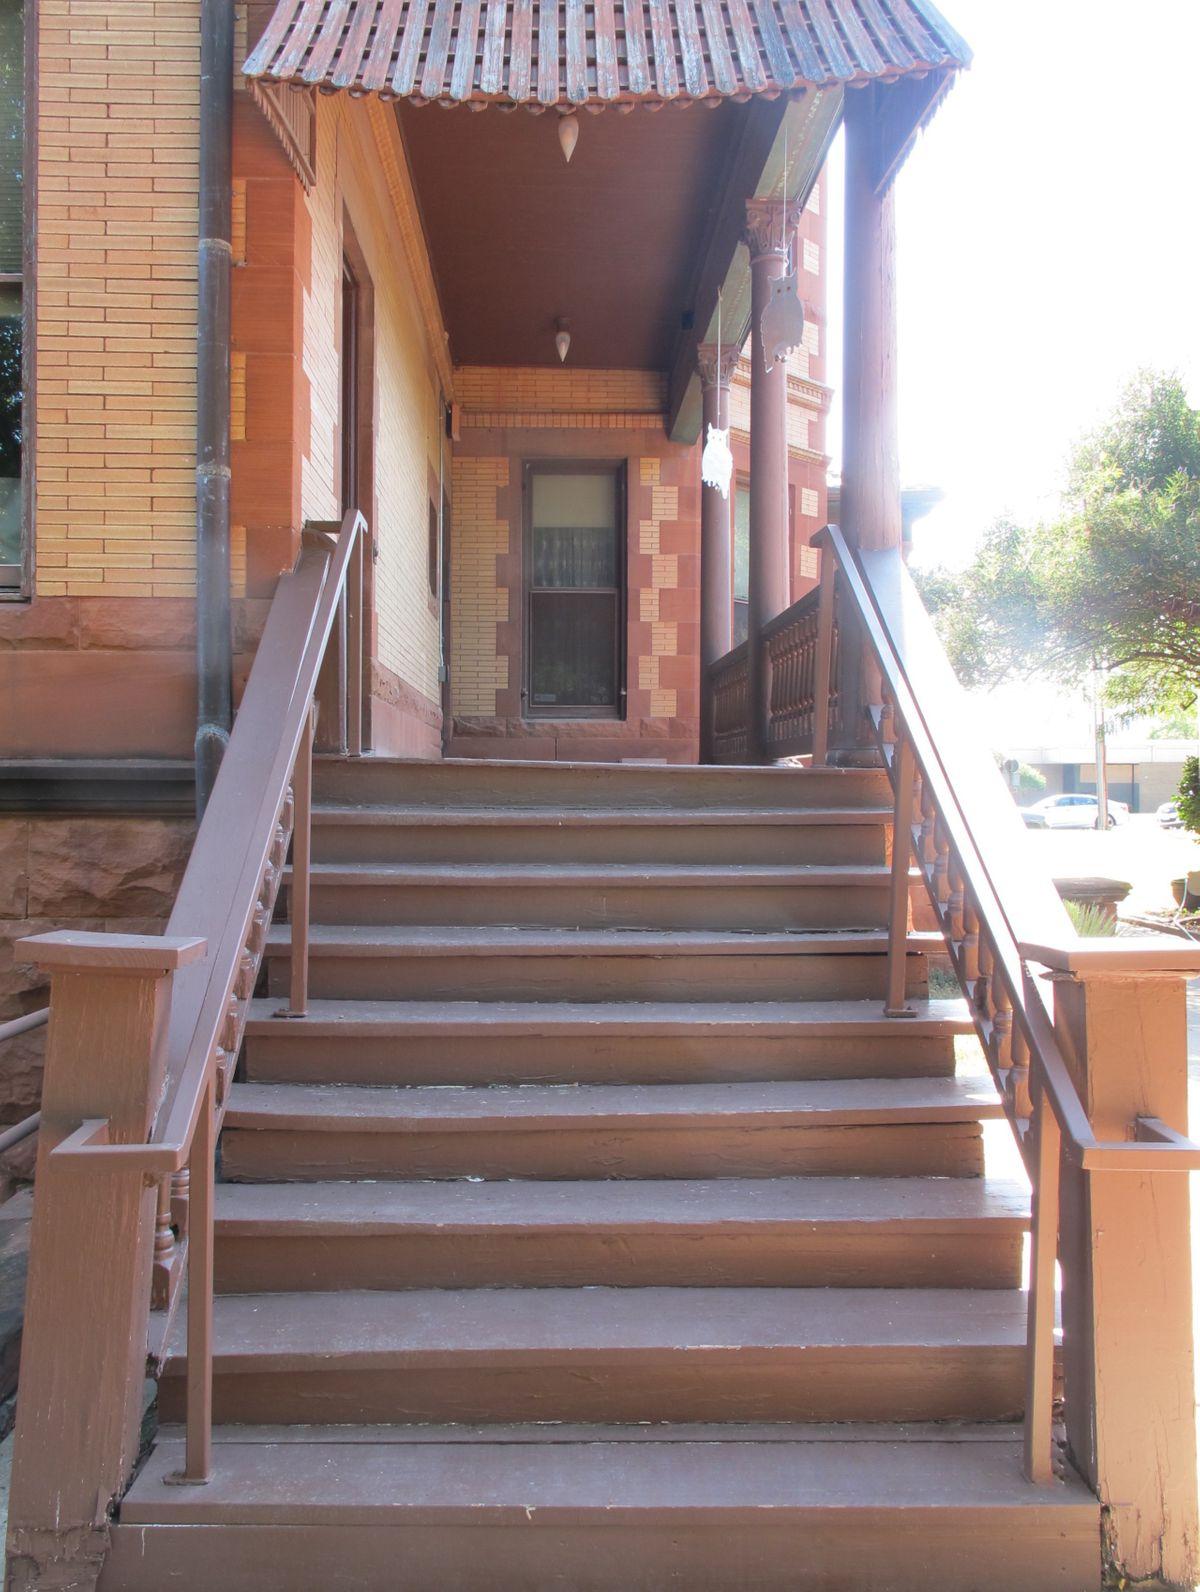 McFarland Historical Home Photo Video Shoot Location Dallas 07.jpg